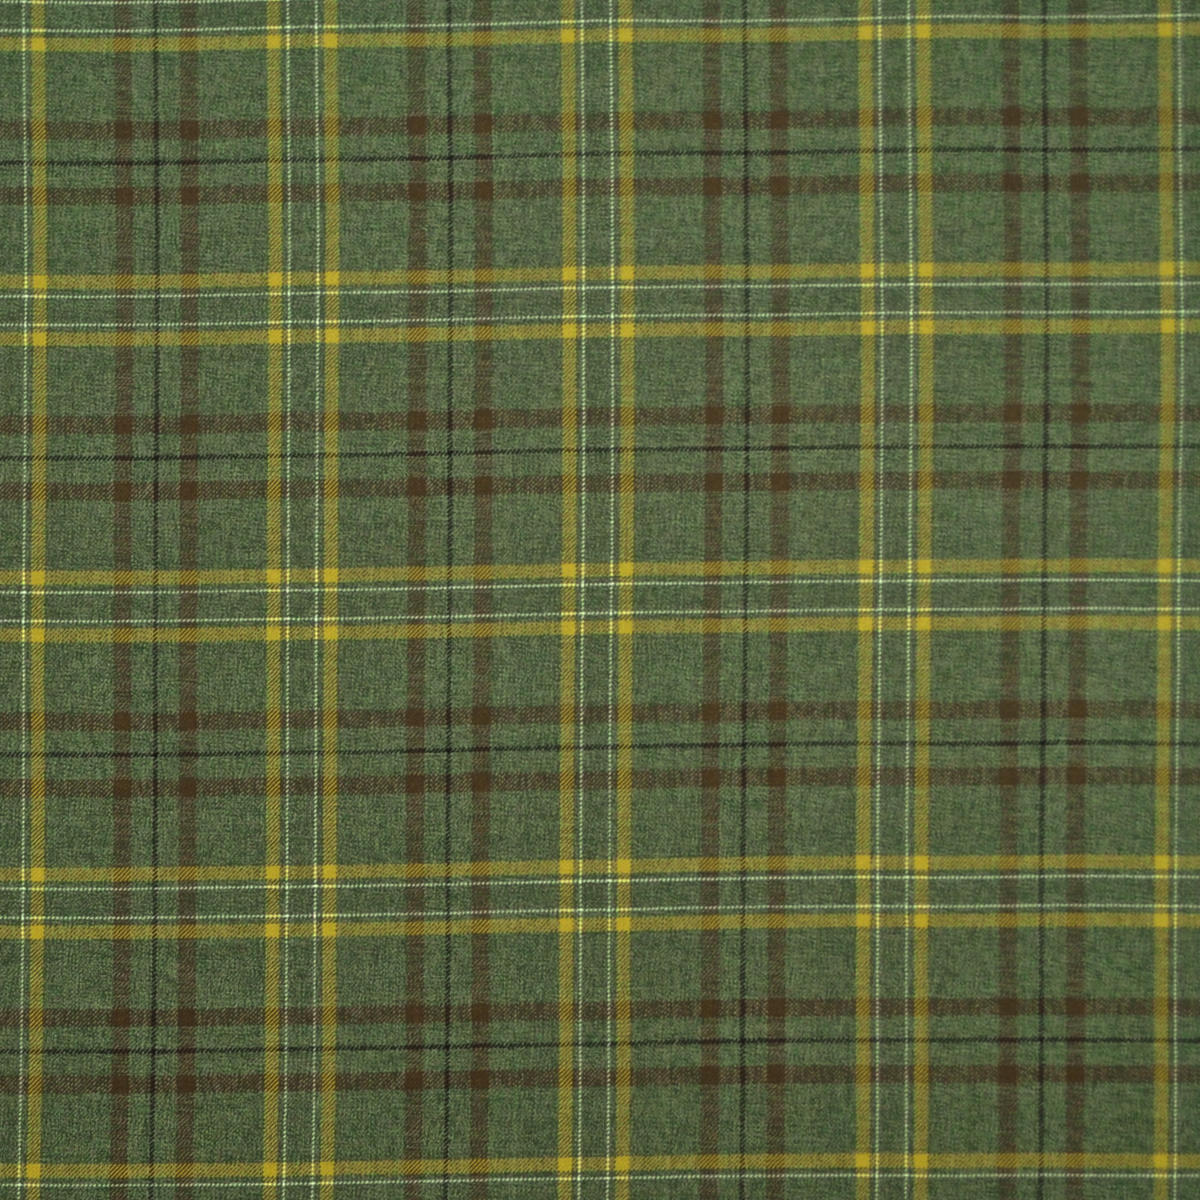 Edinburgh Olive Fern